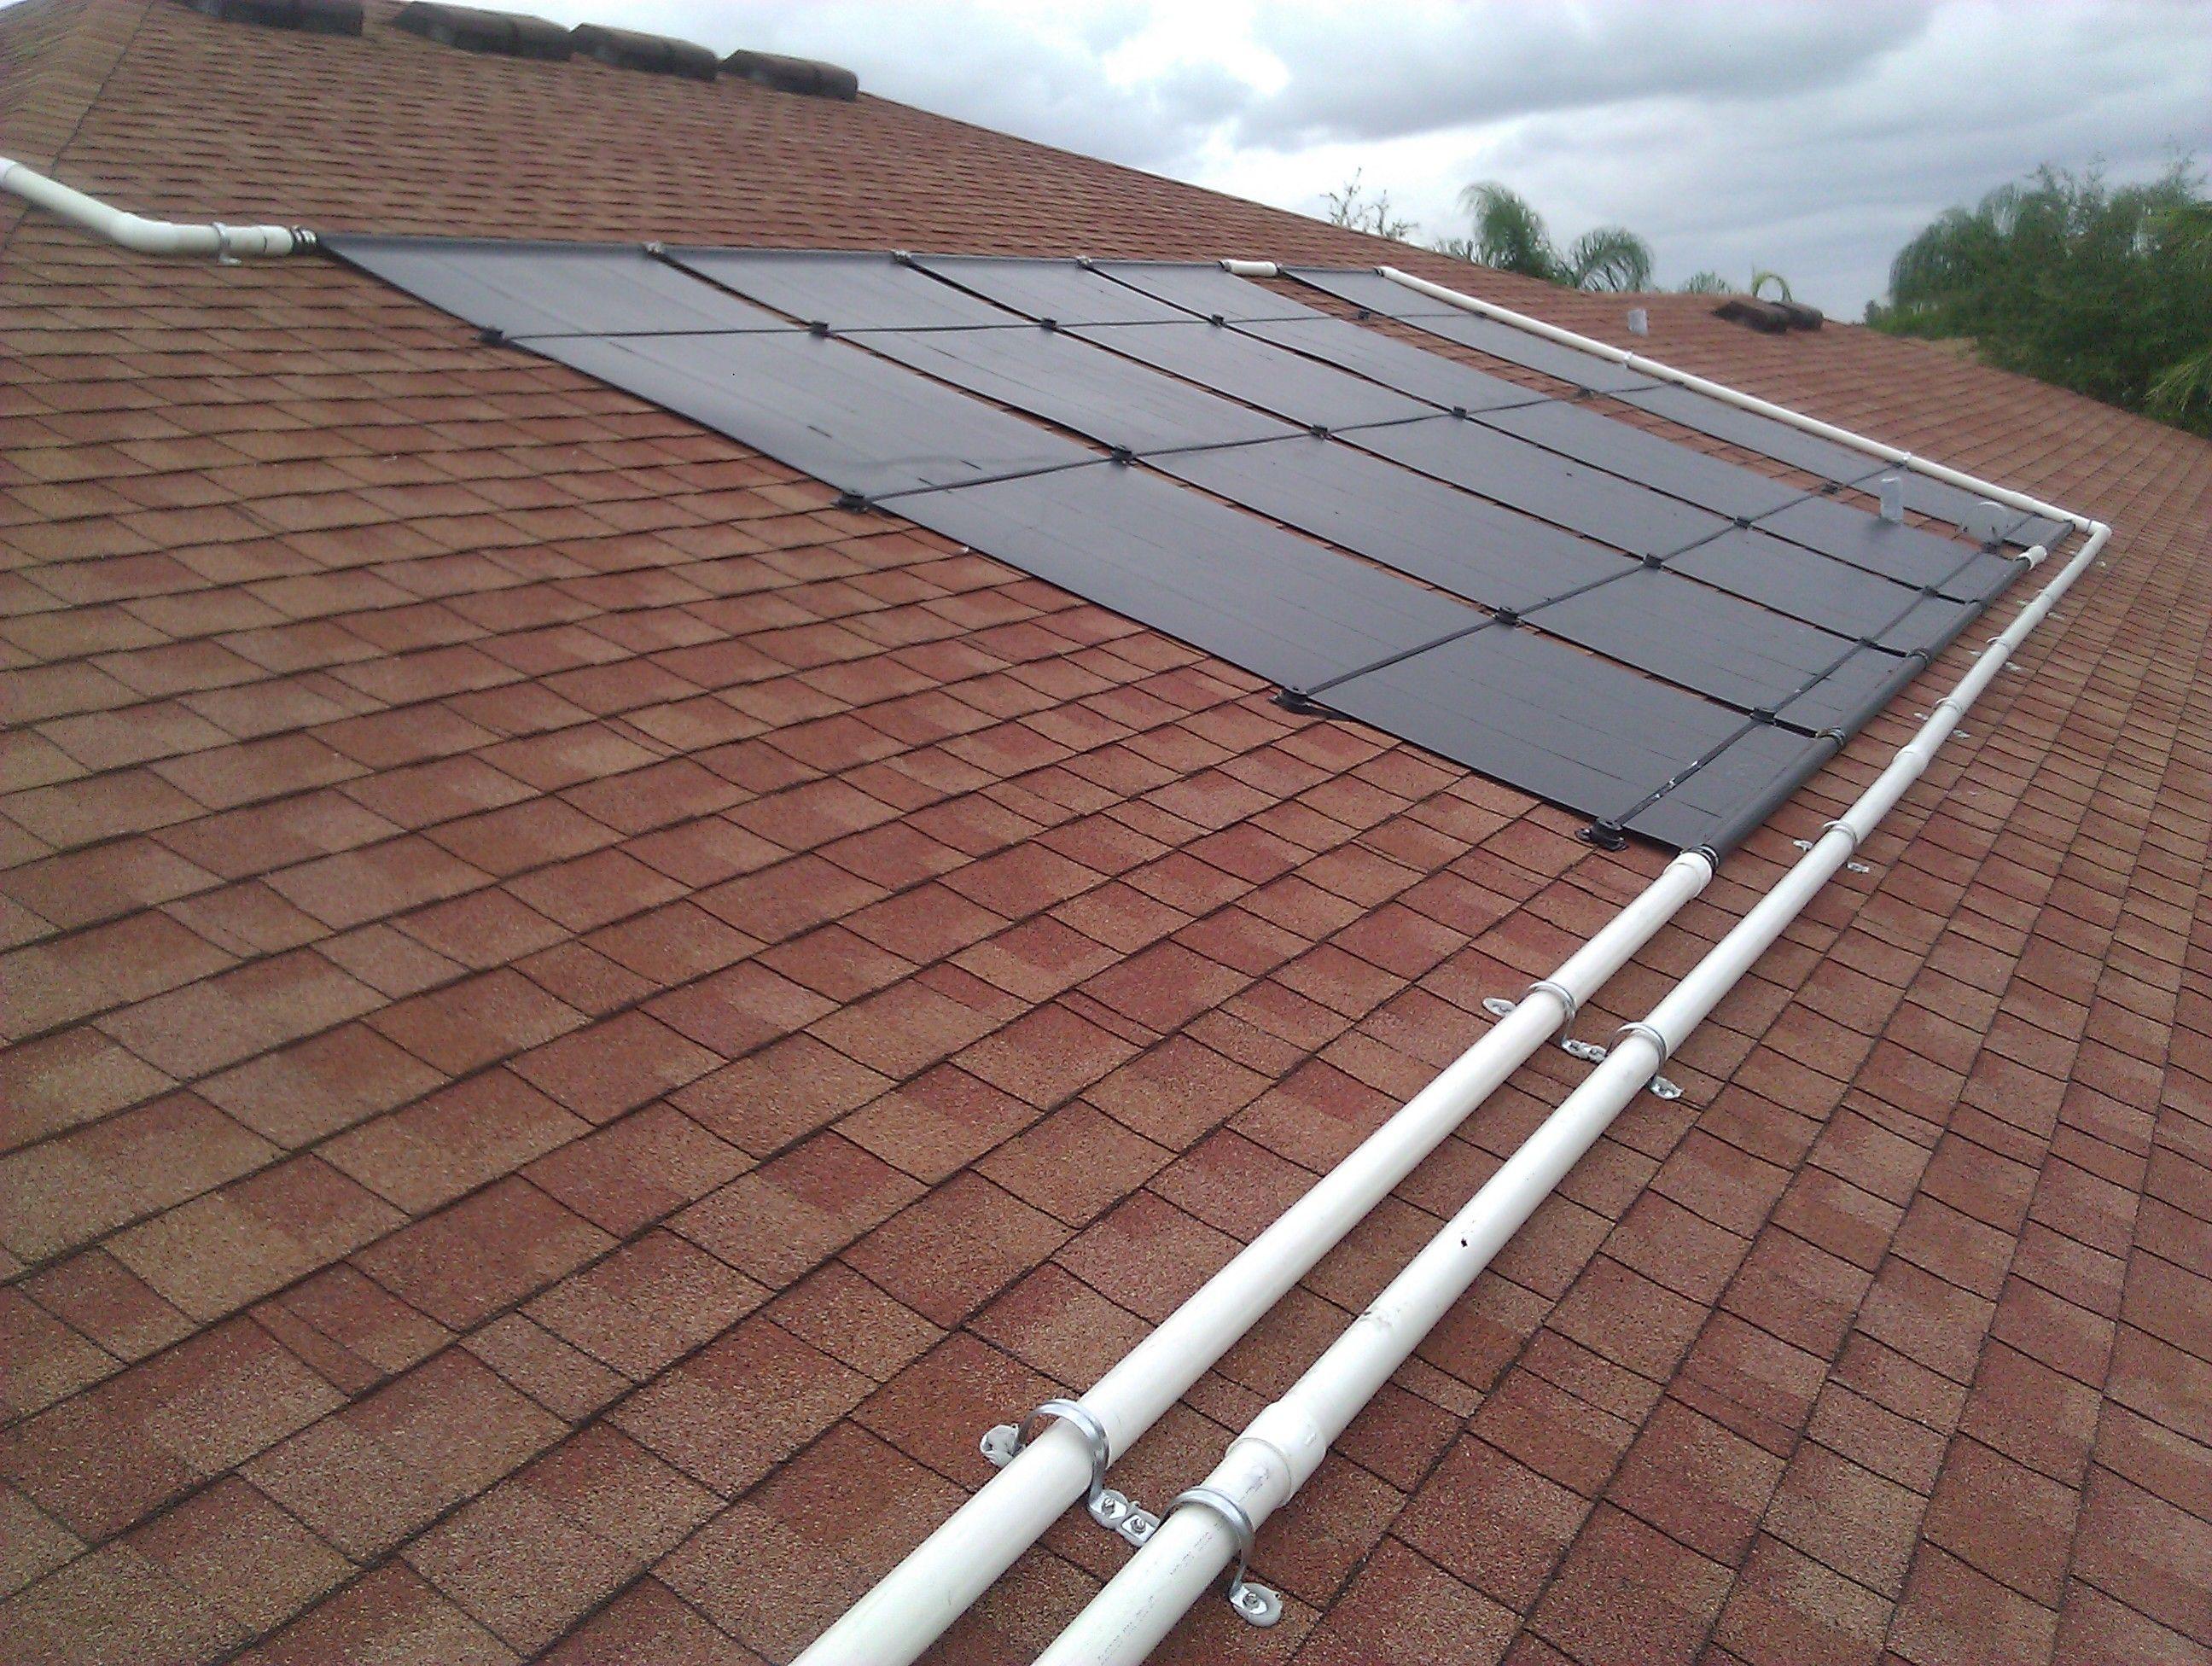 Vortex Solar Pool Heater Www Diysolarpoolheaterkits Com Solar Pool Heating Pool Heaters Solar Pool Heater